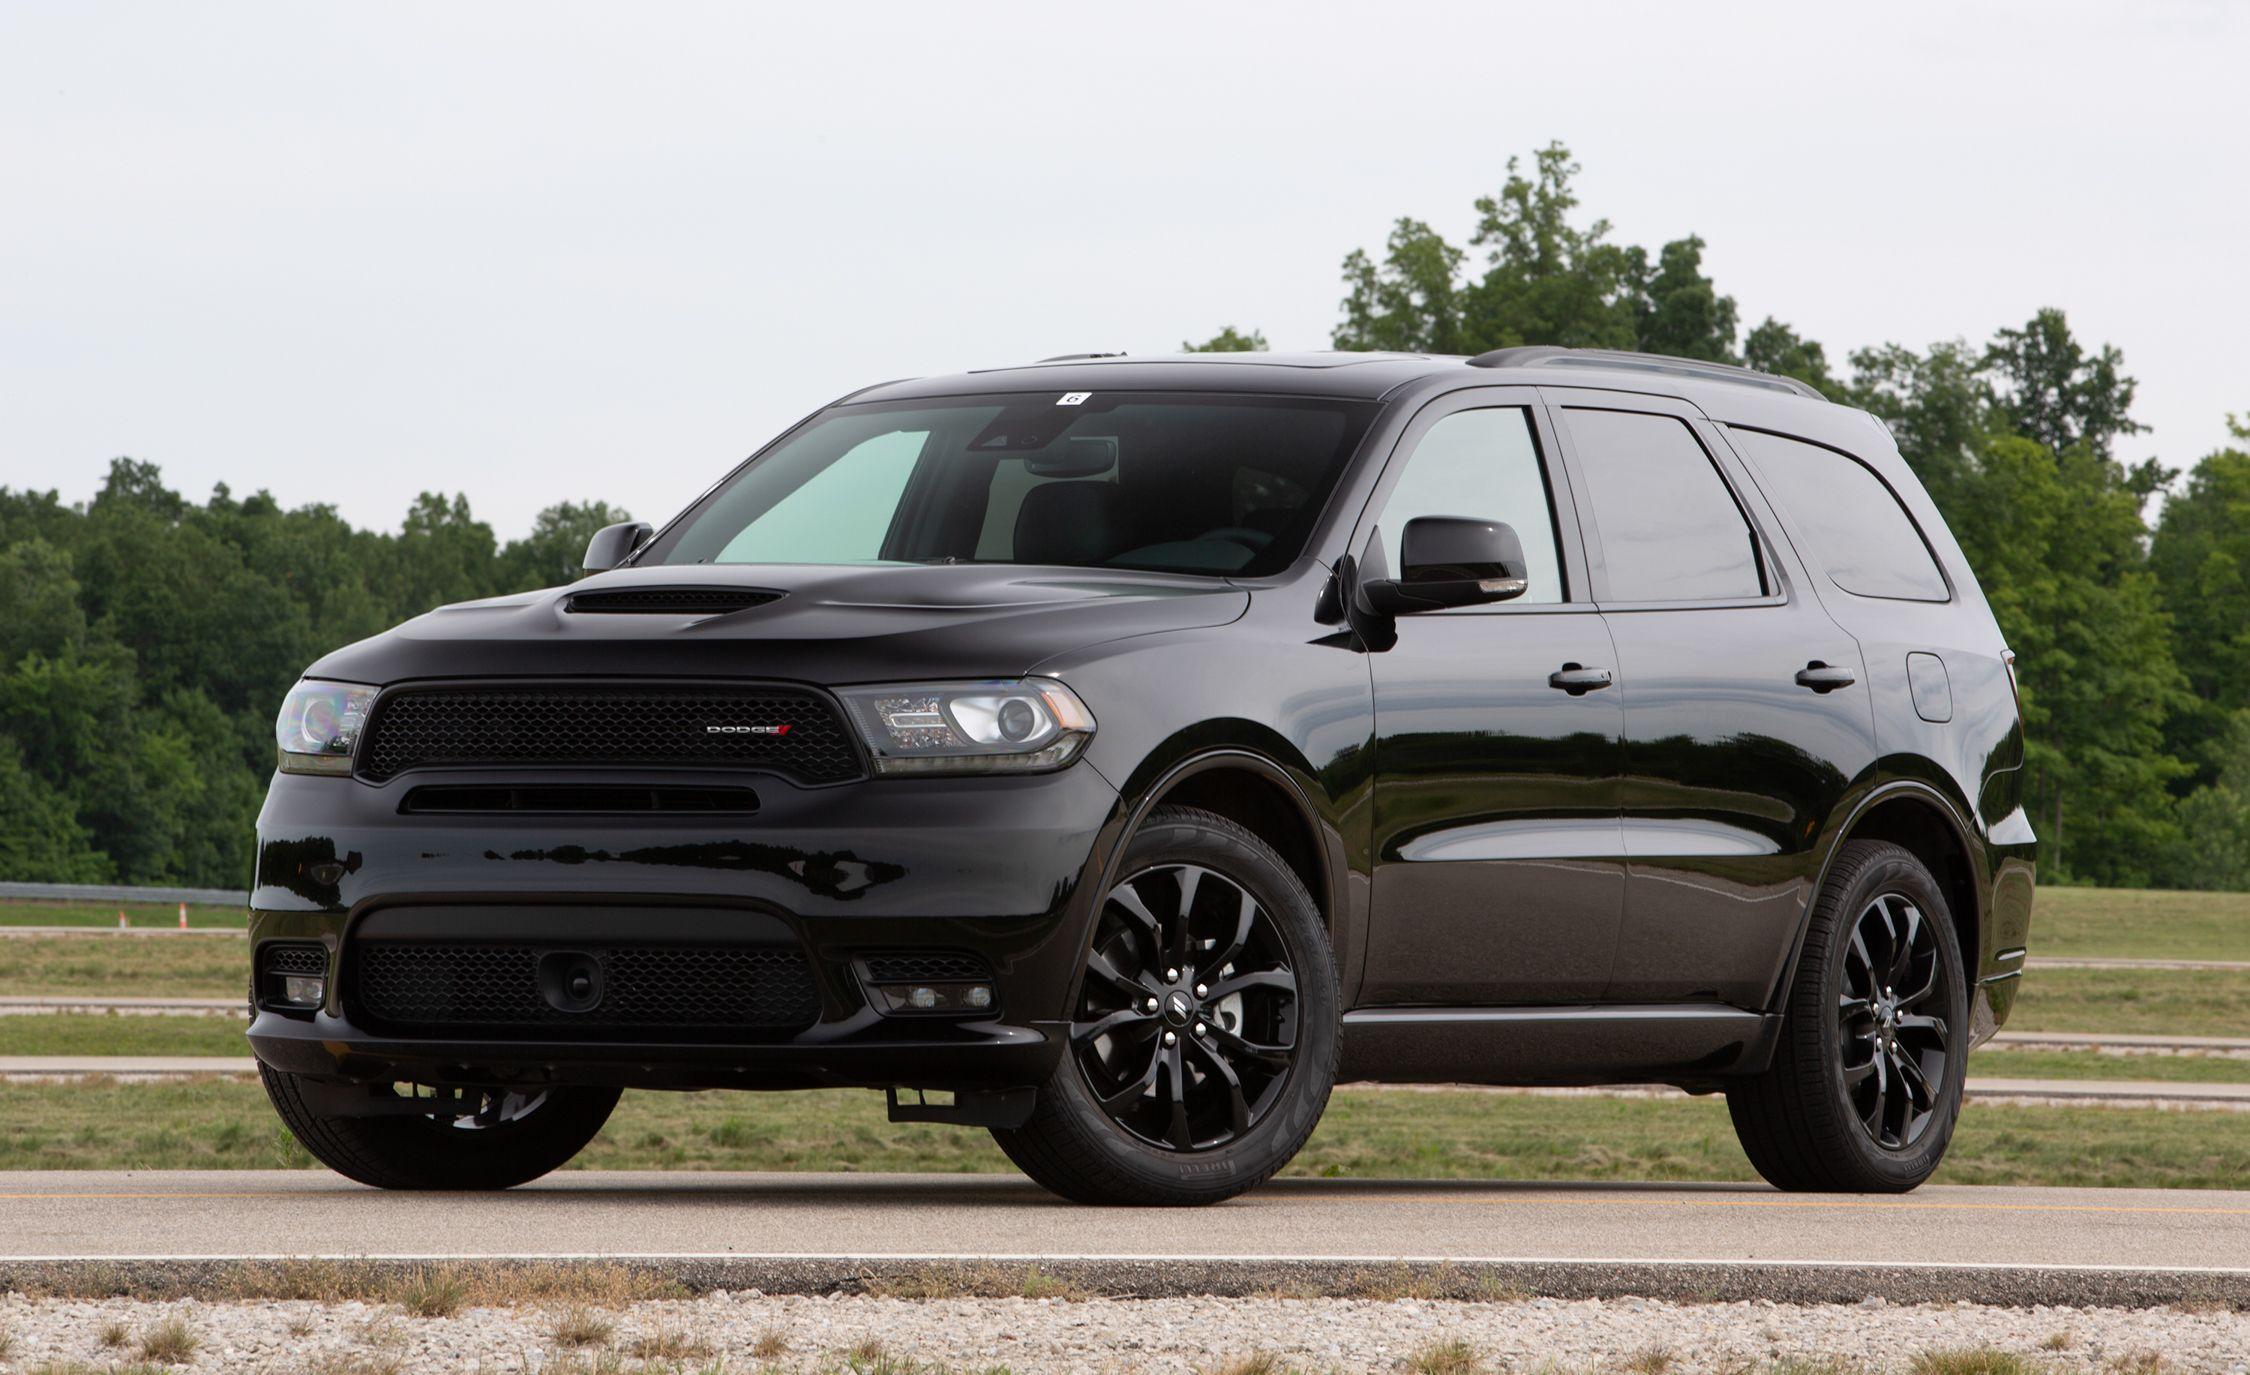 2019 Dodge Durango | News | Car and Driver